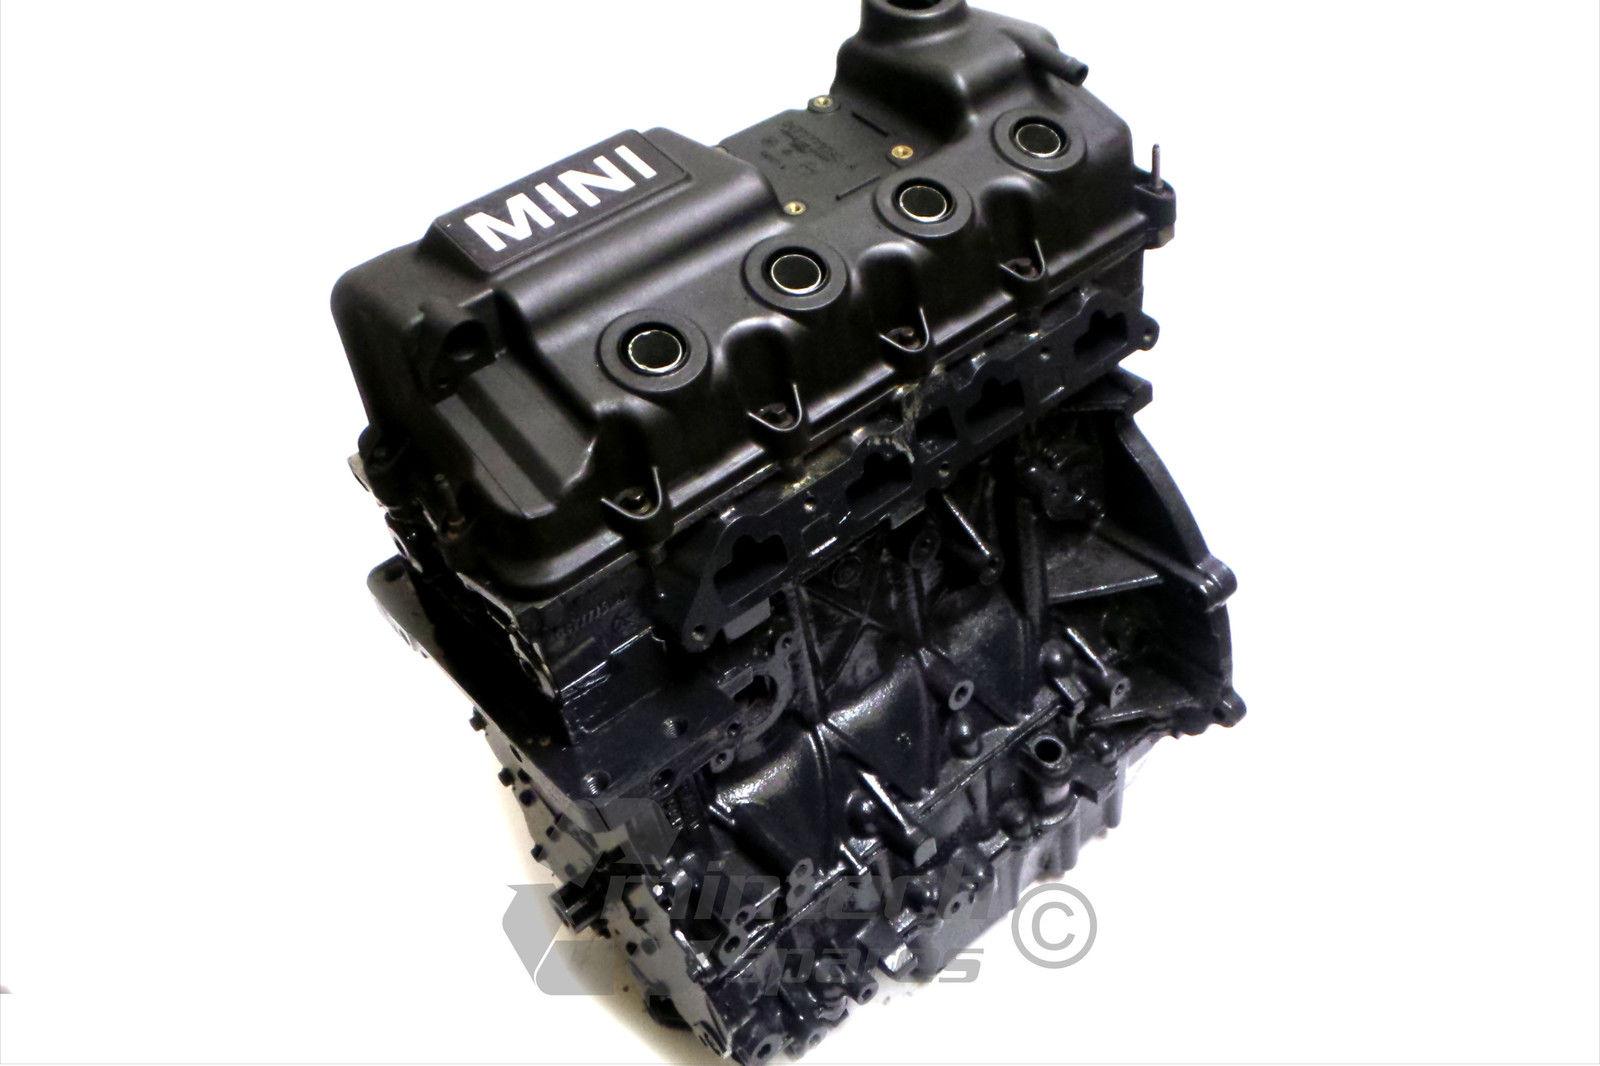 reconditioned mini engine W10 1.6 petrol